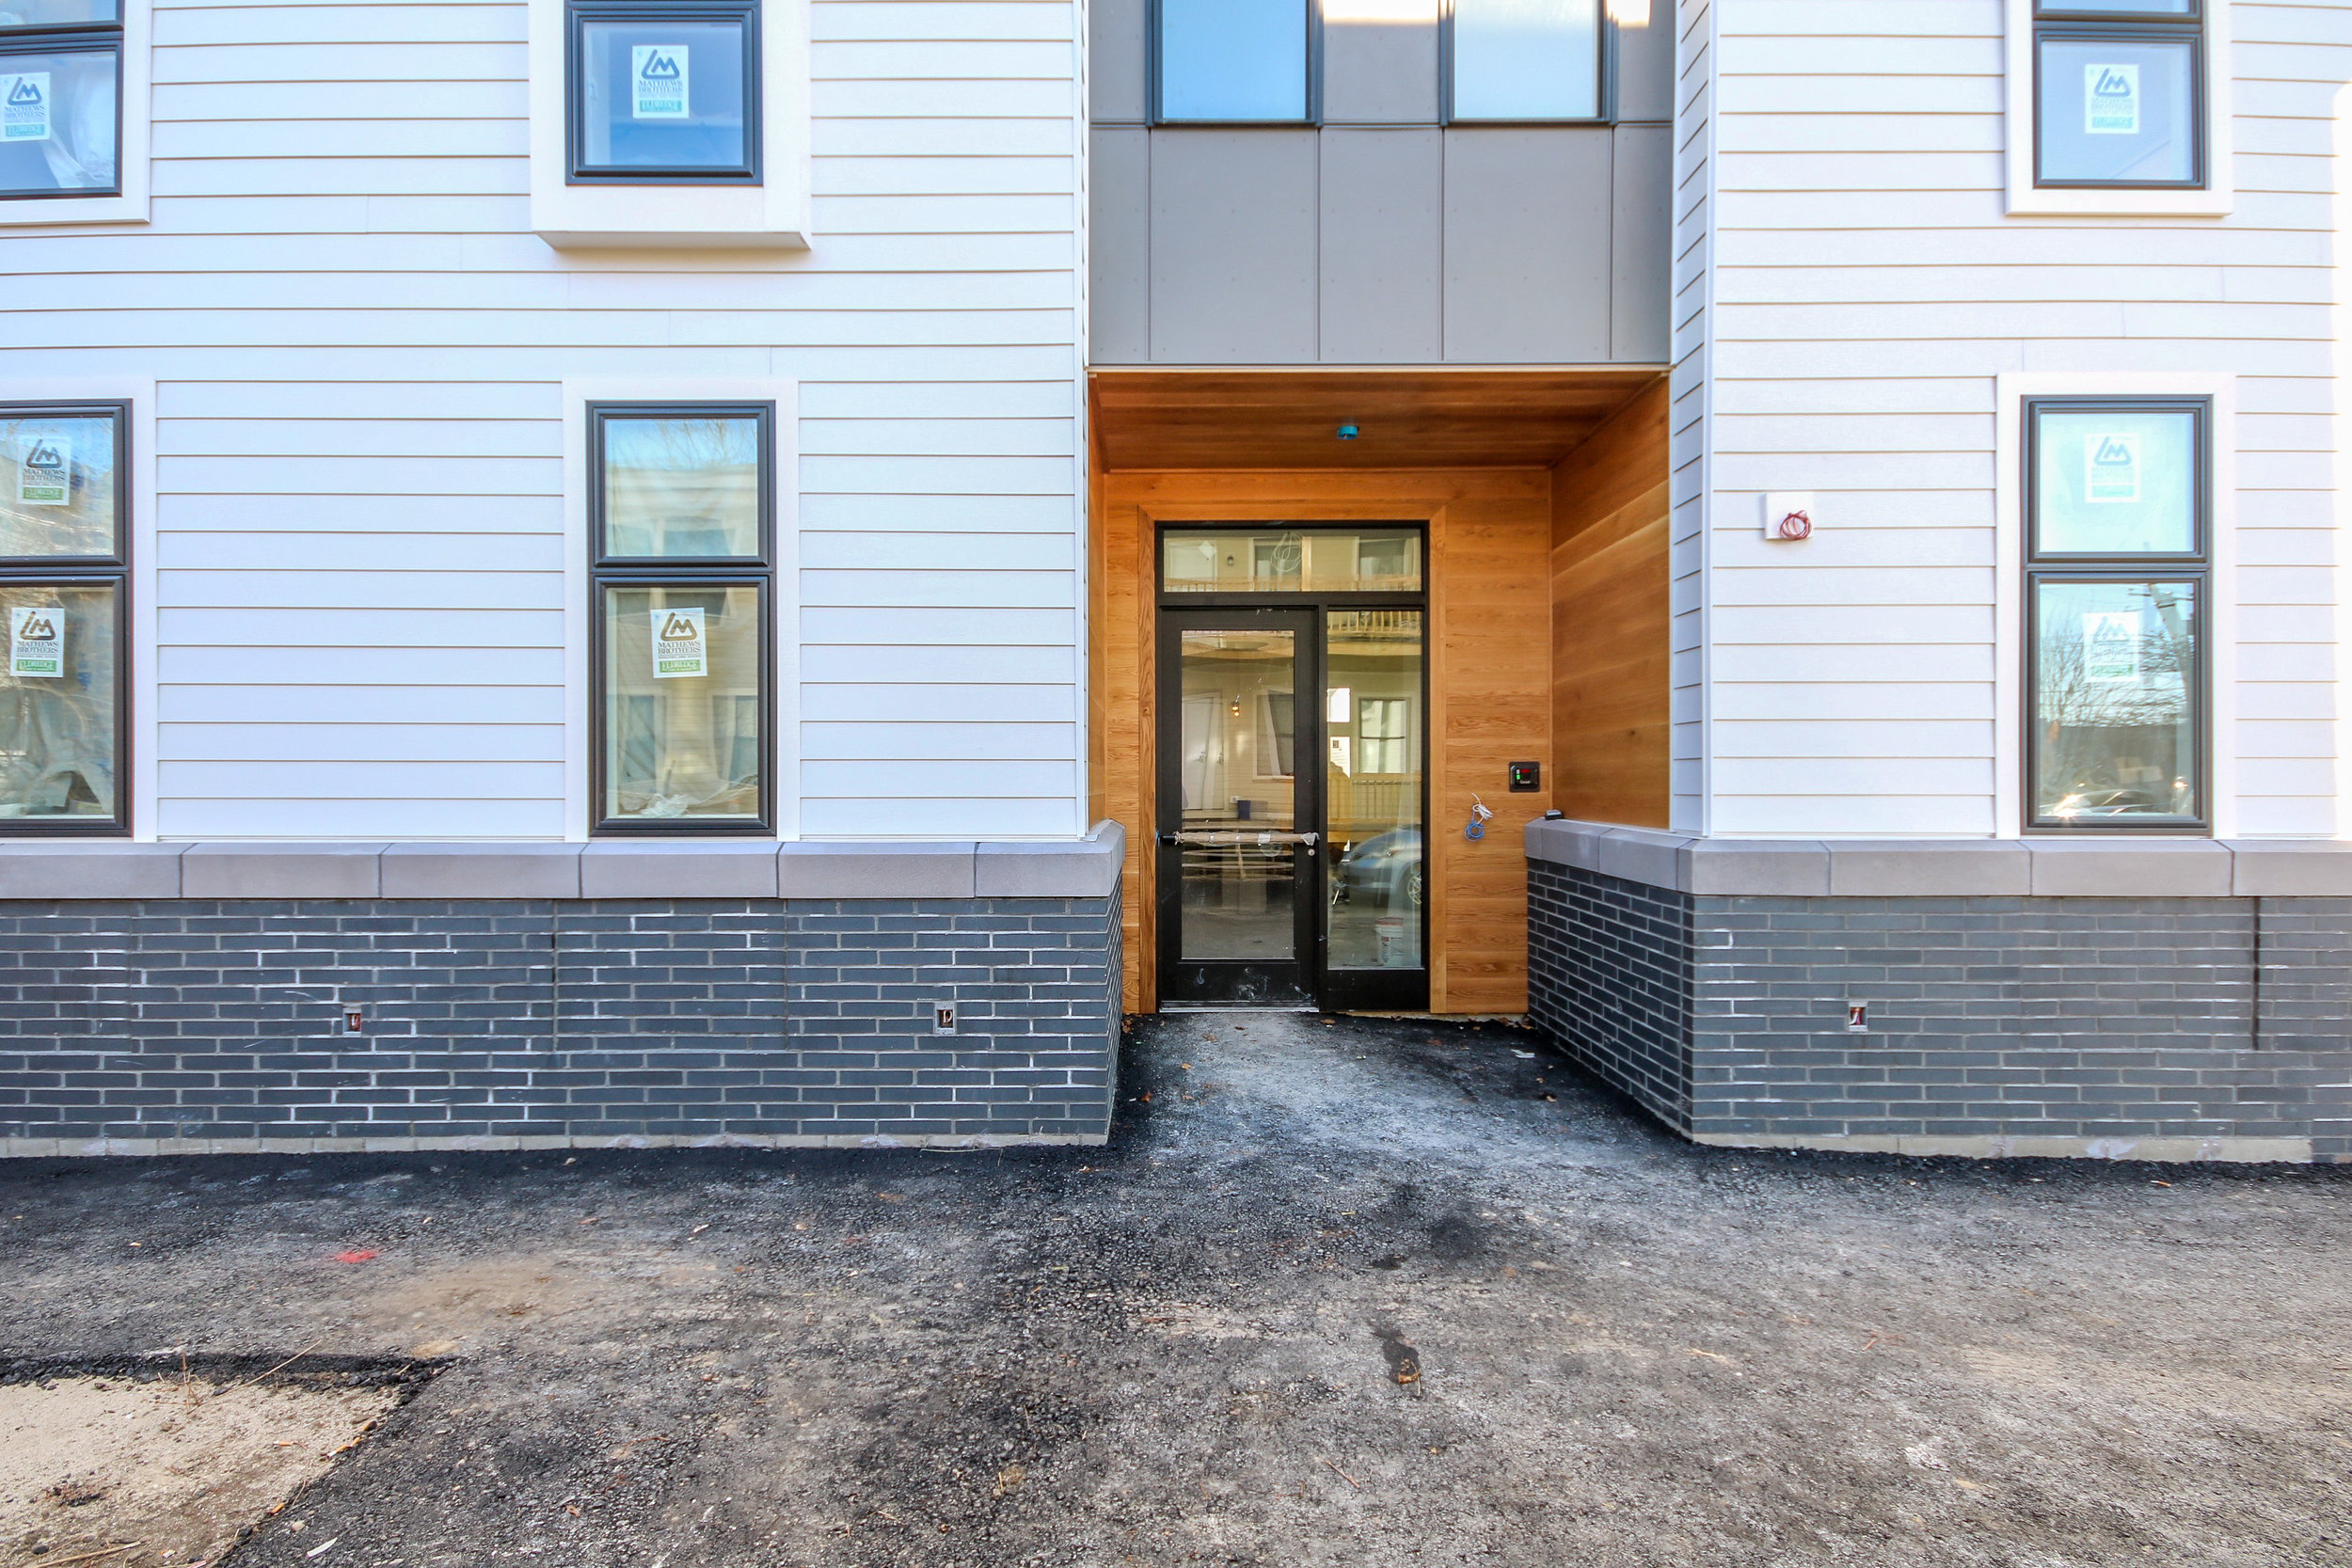 Exterior Construction Update - 12/9/18